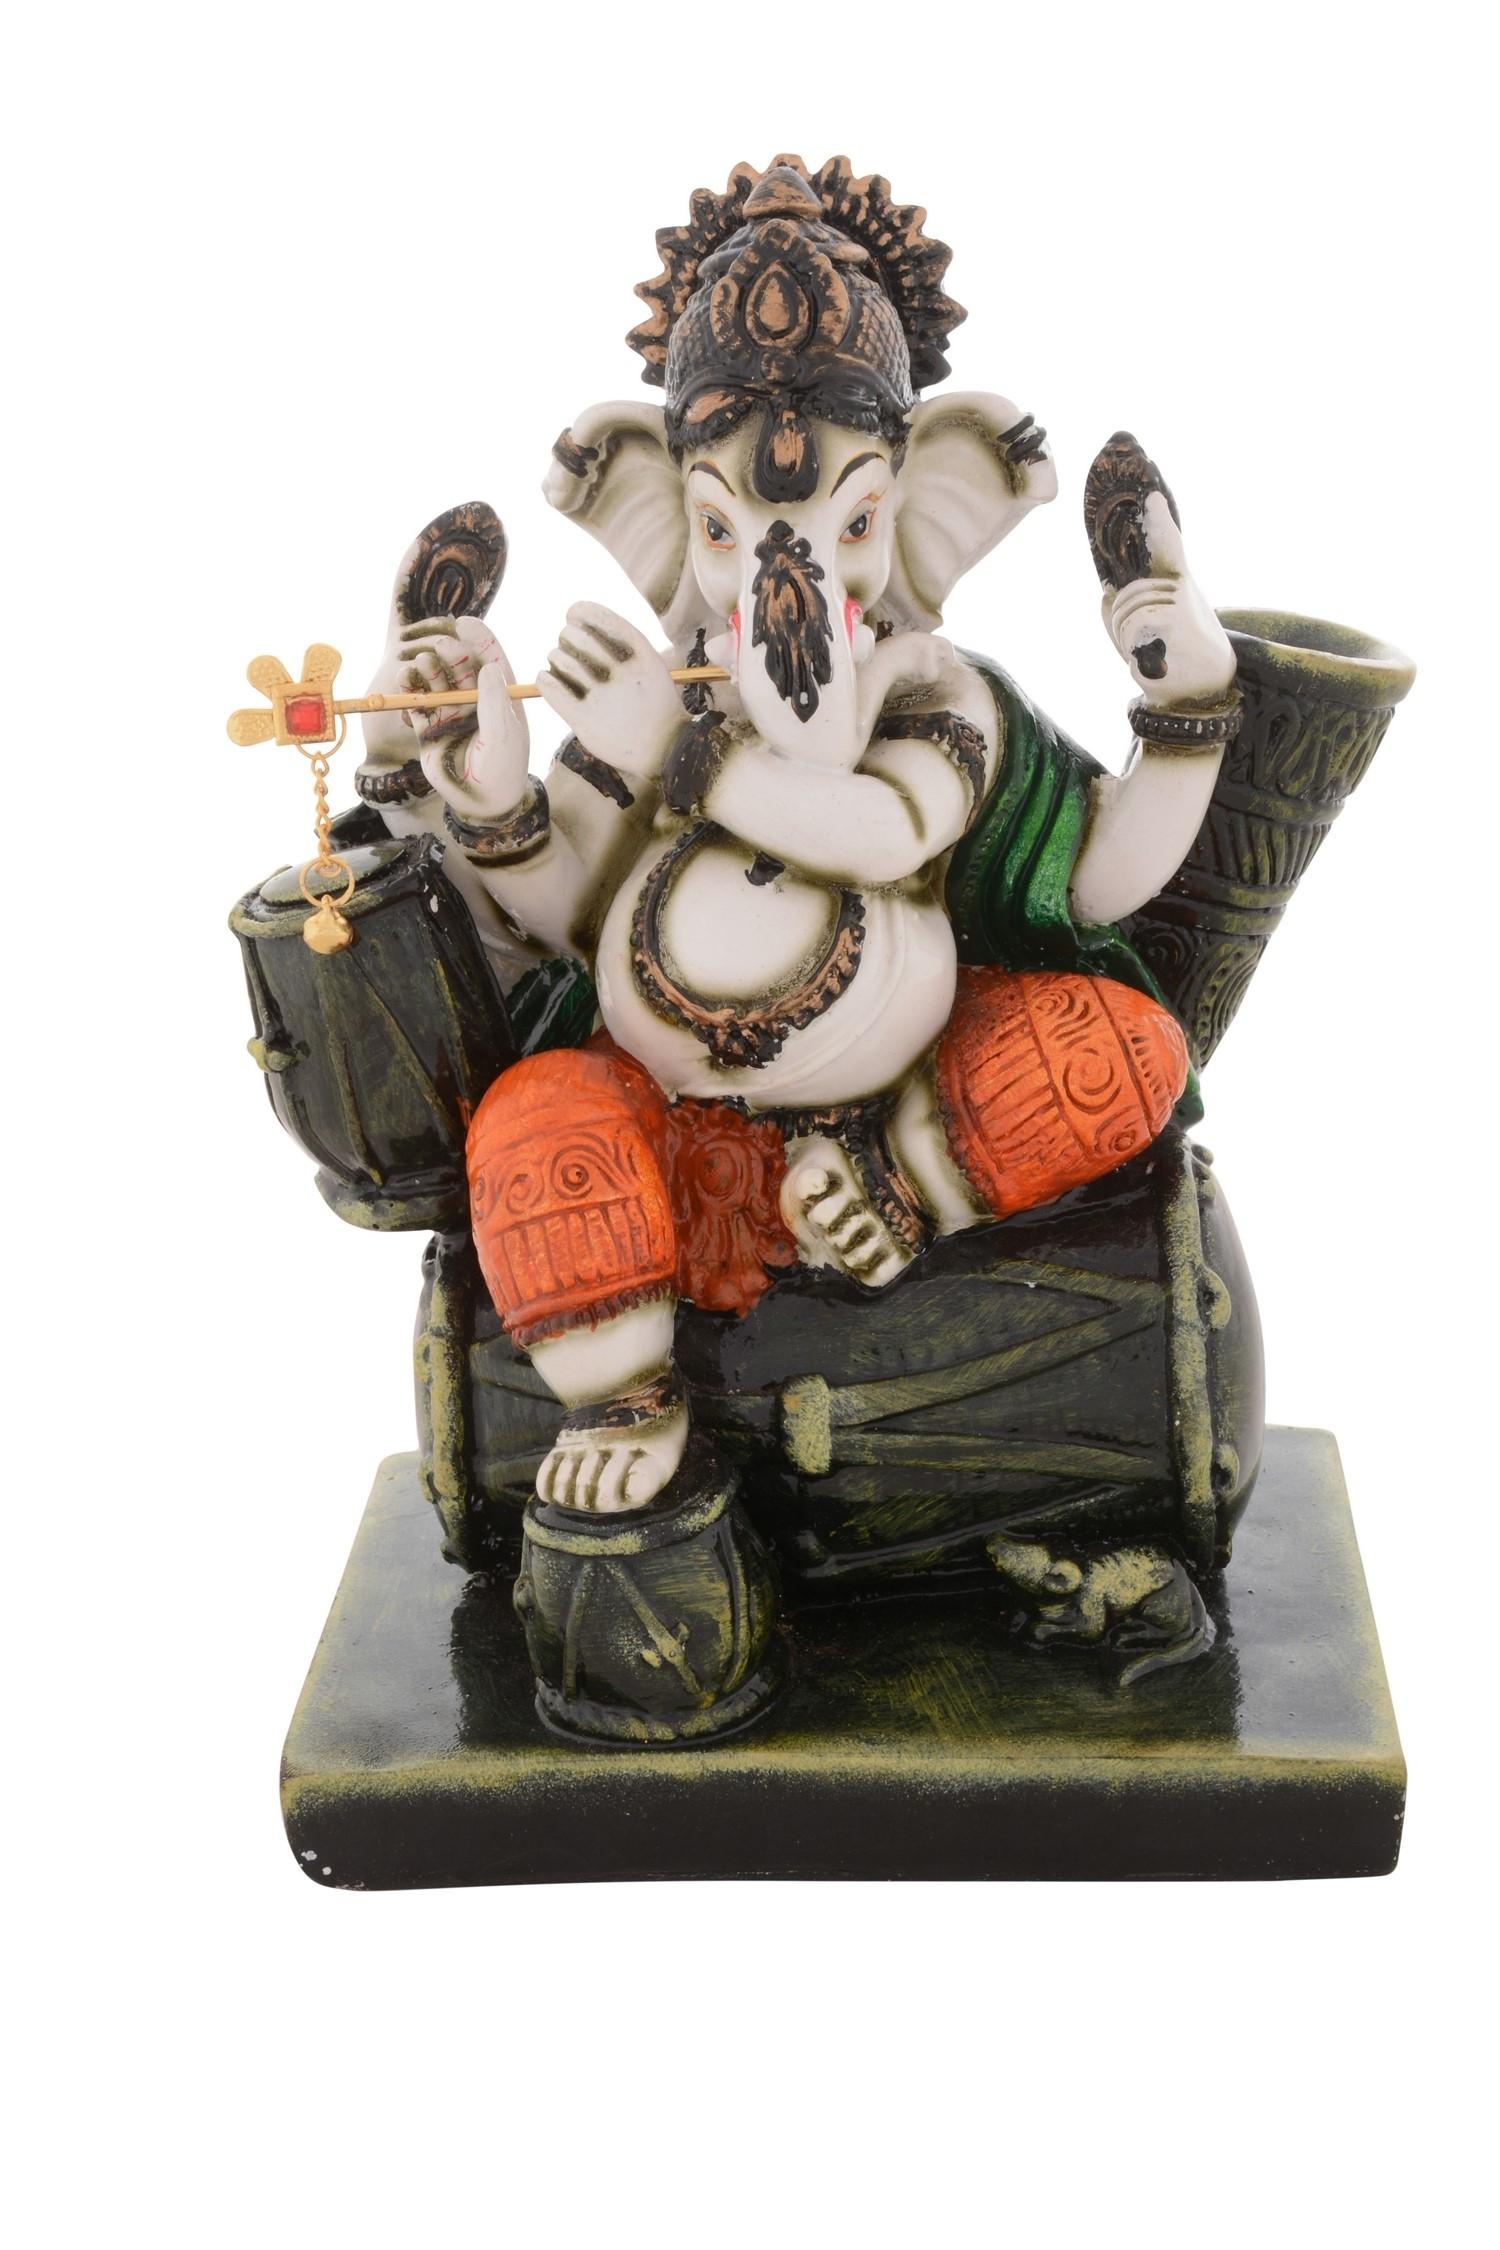 Premium Figurine of Blessing Chaturbhuj Lord Ganesha Indian Home Decor